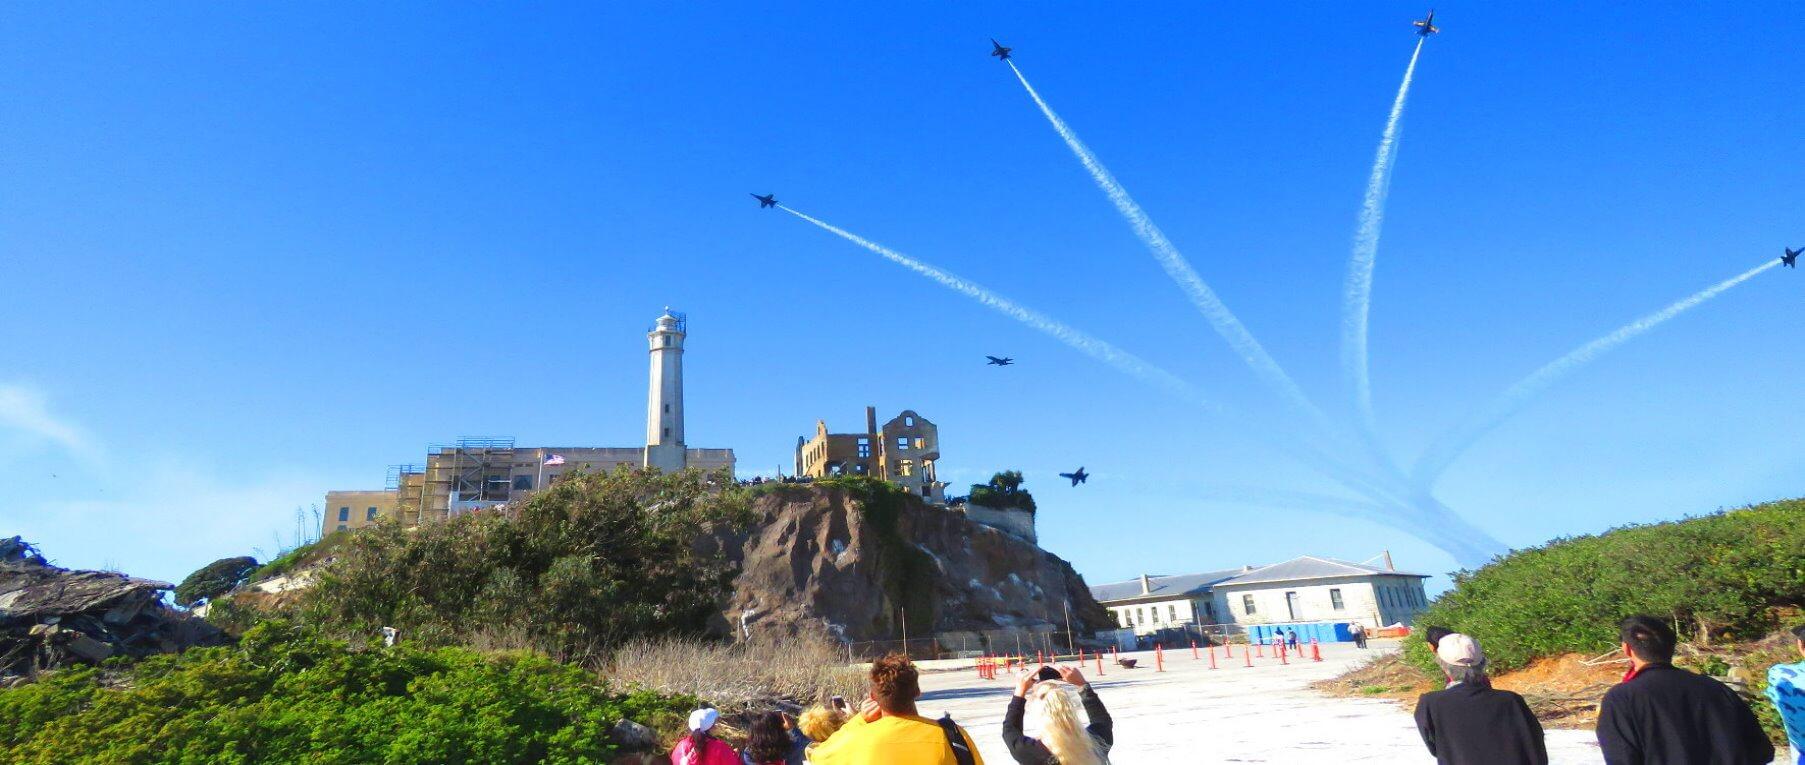 alcatraz-island-prison-tours+tickets-alcatraz-boat-trip